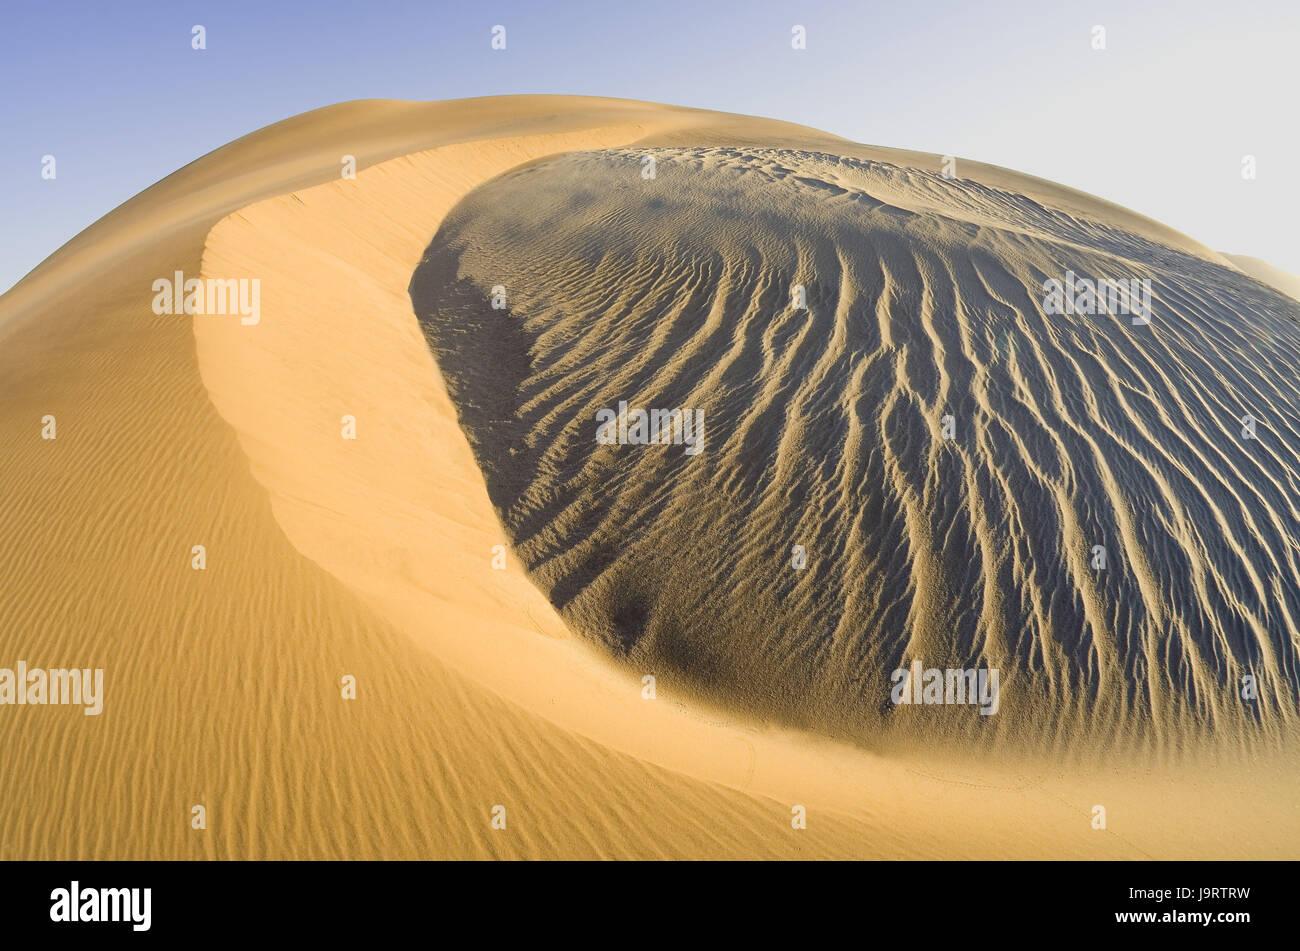 South-West Africa,Namibia,Namib desert,dune area,dune hilltop,older subsoil,Sandrippel,dark-coloured Anwehungen,gleams, - Stock Image